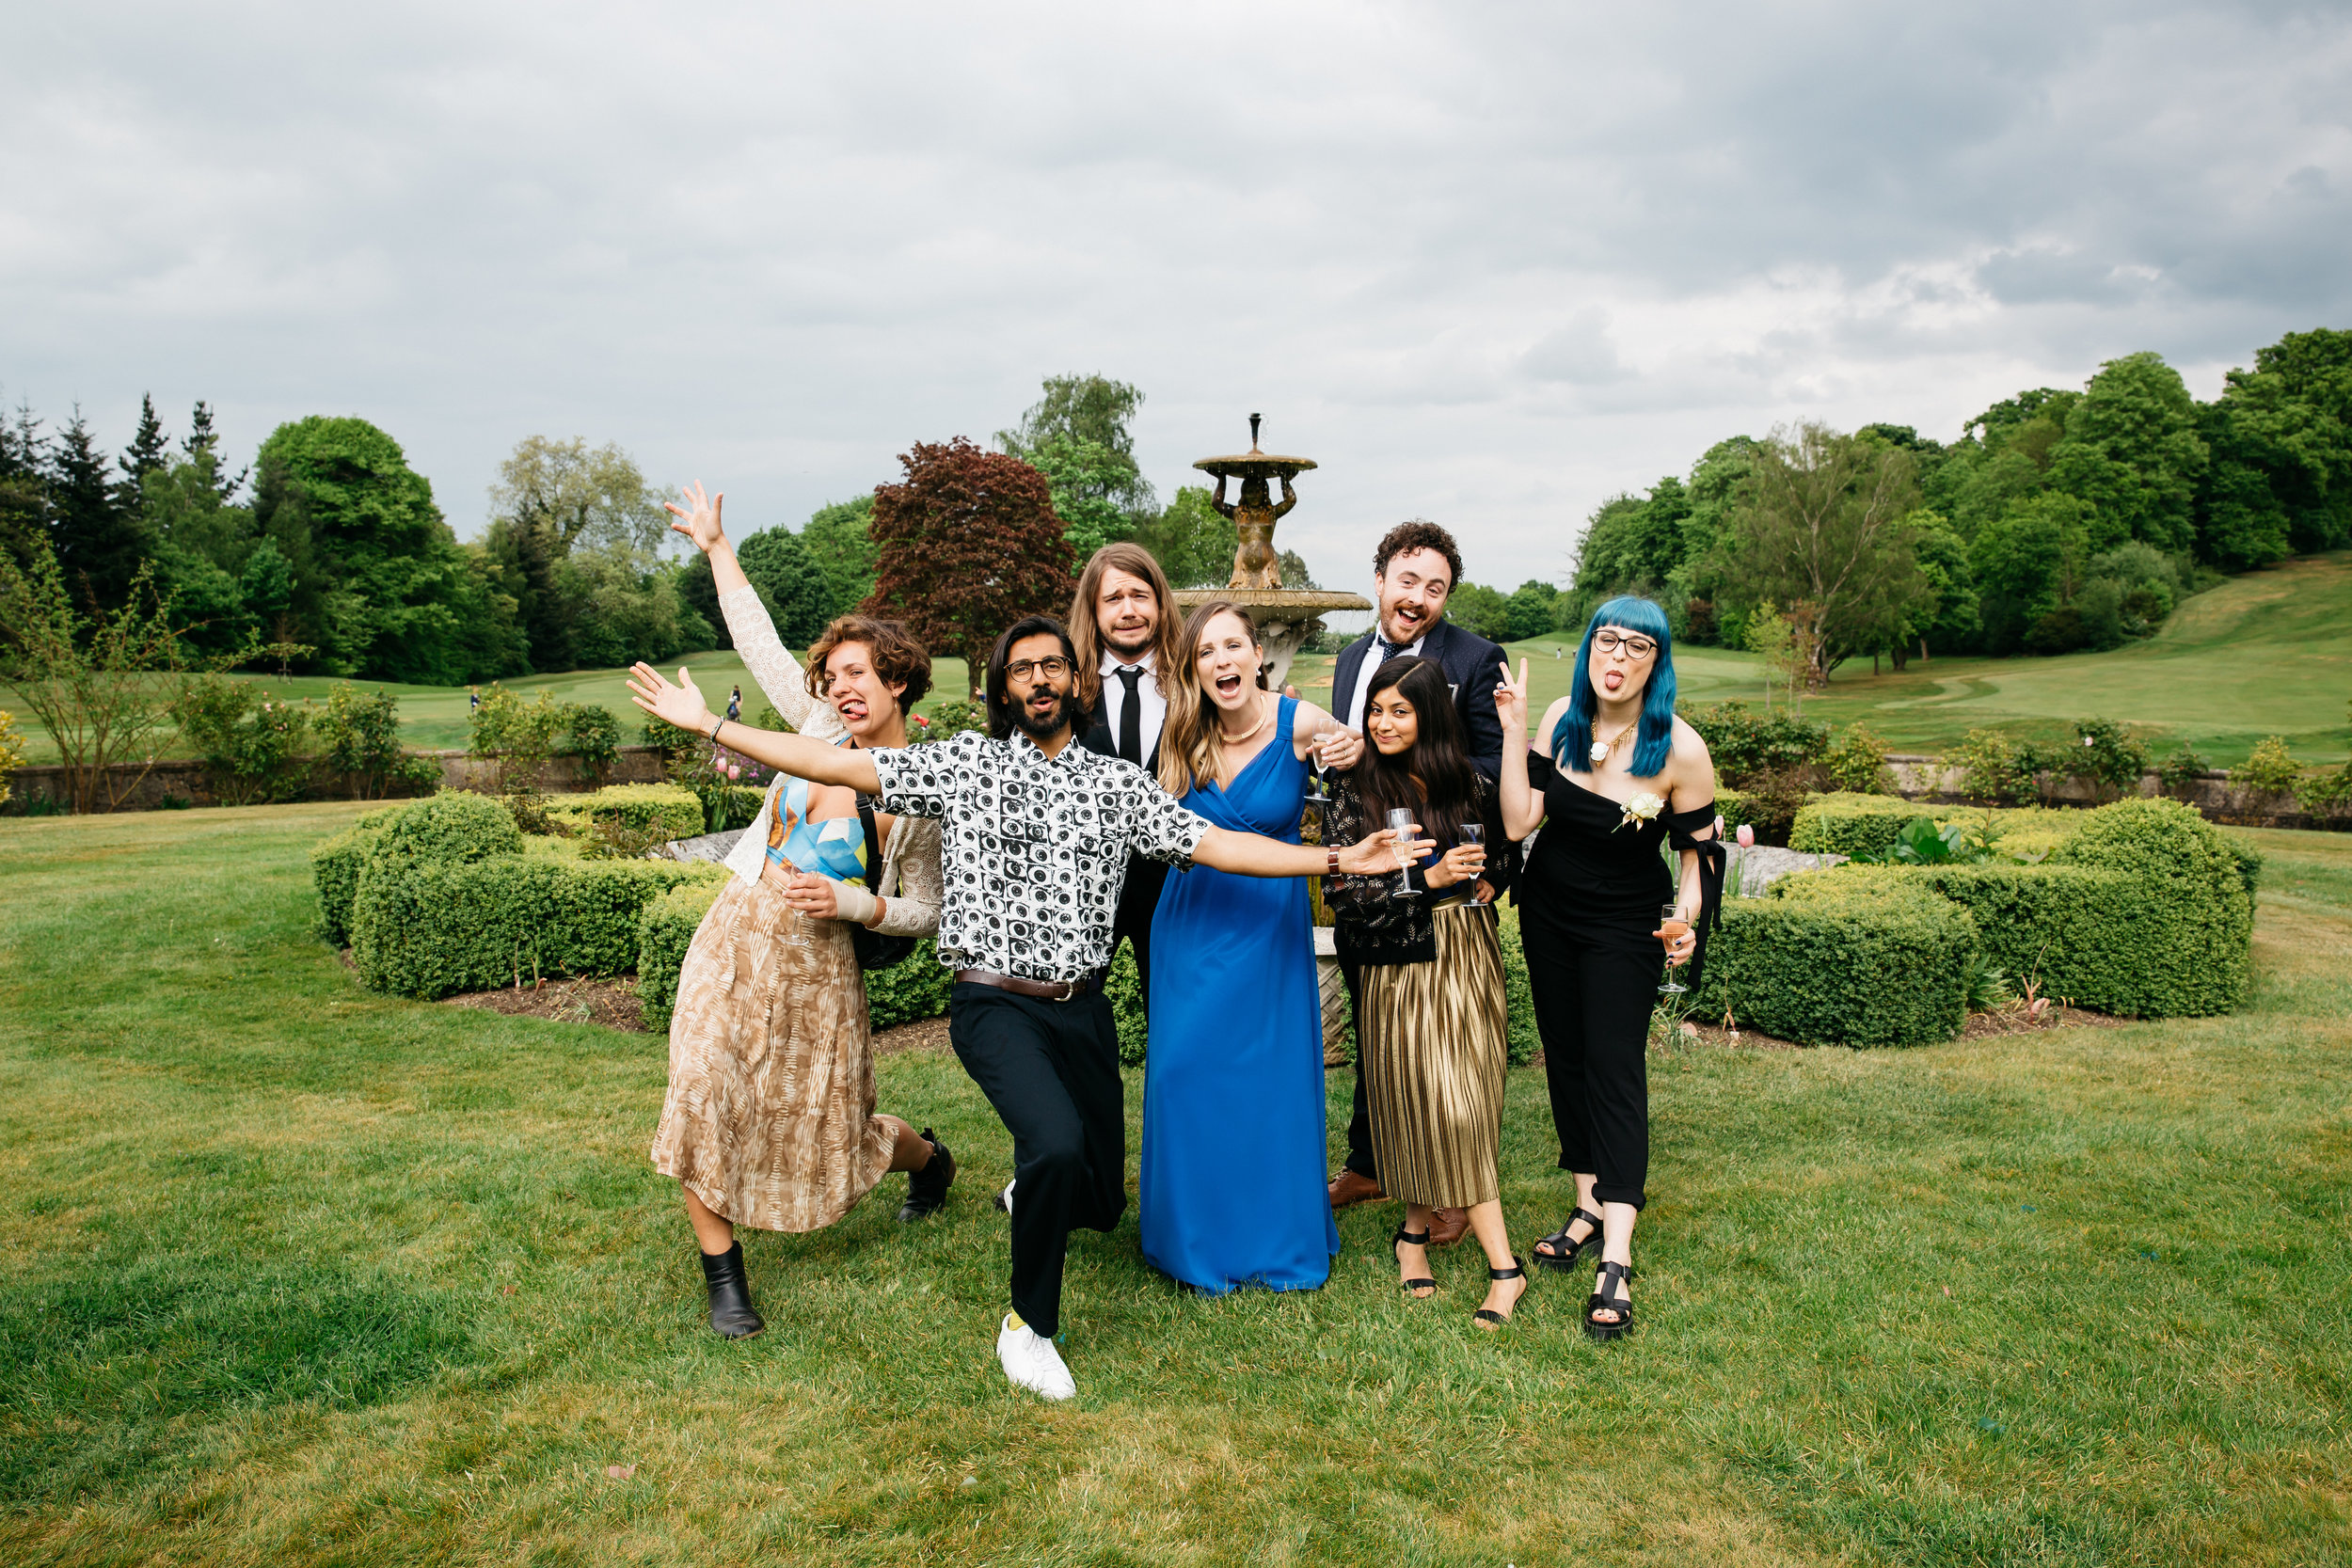 Friends at wedding